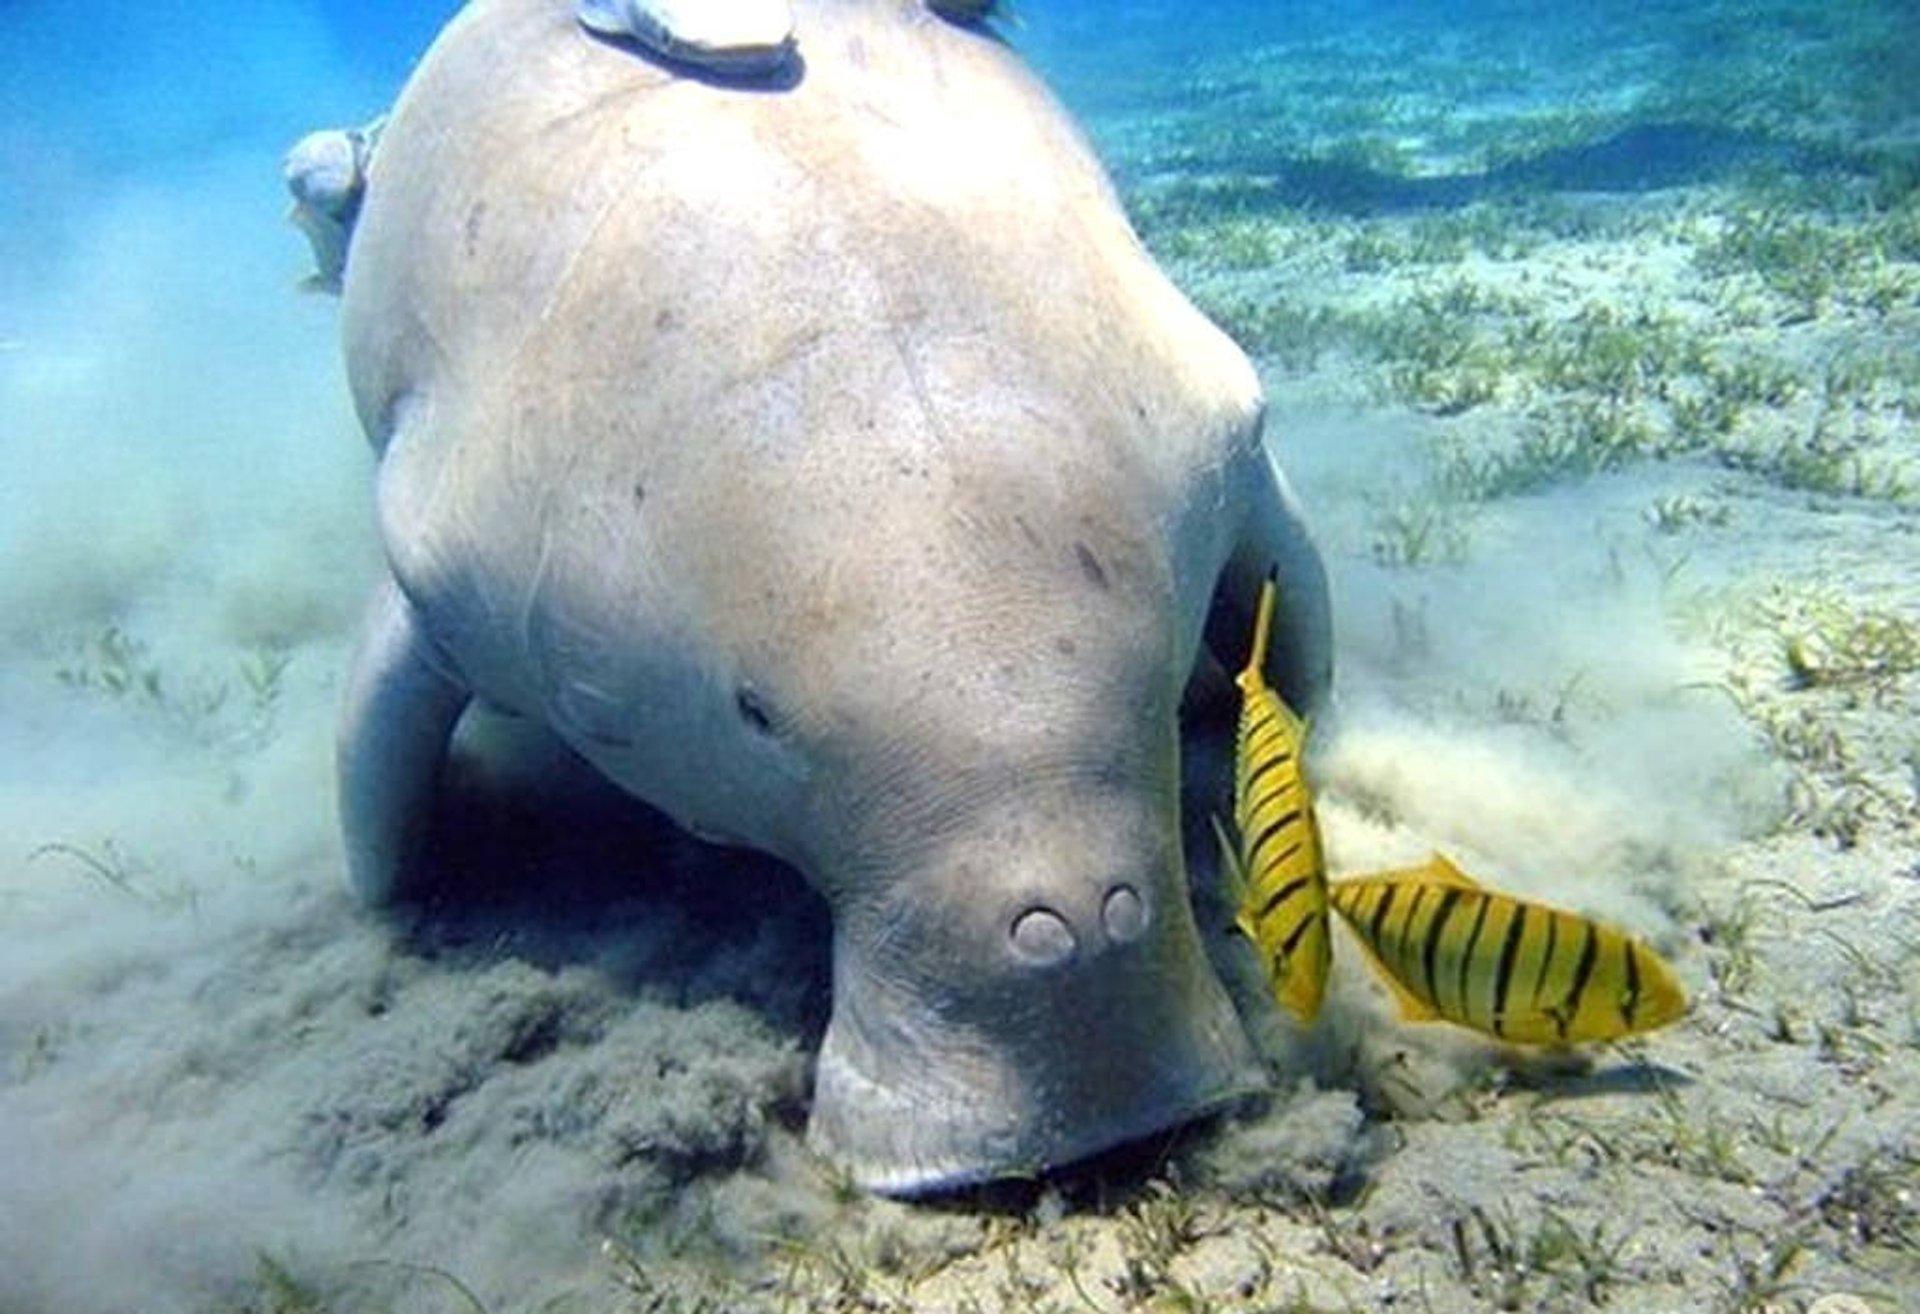 Scuba Diving in Vietnam 2020 - Best Time